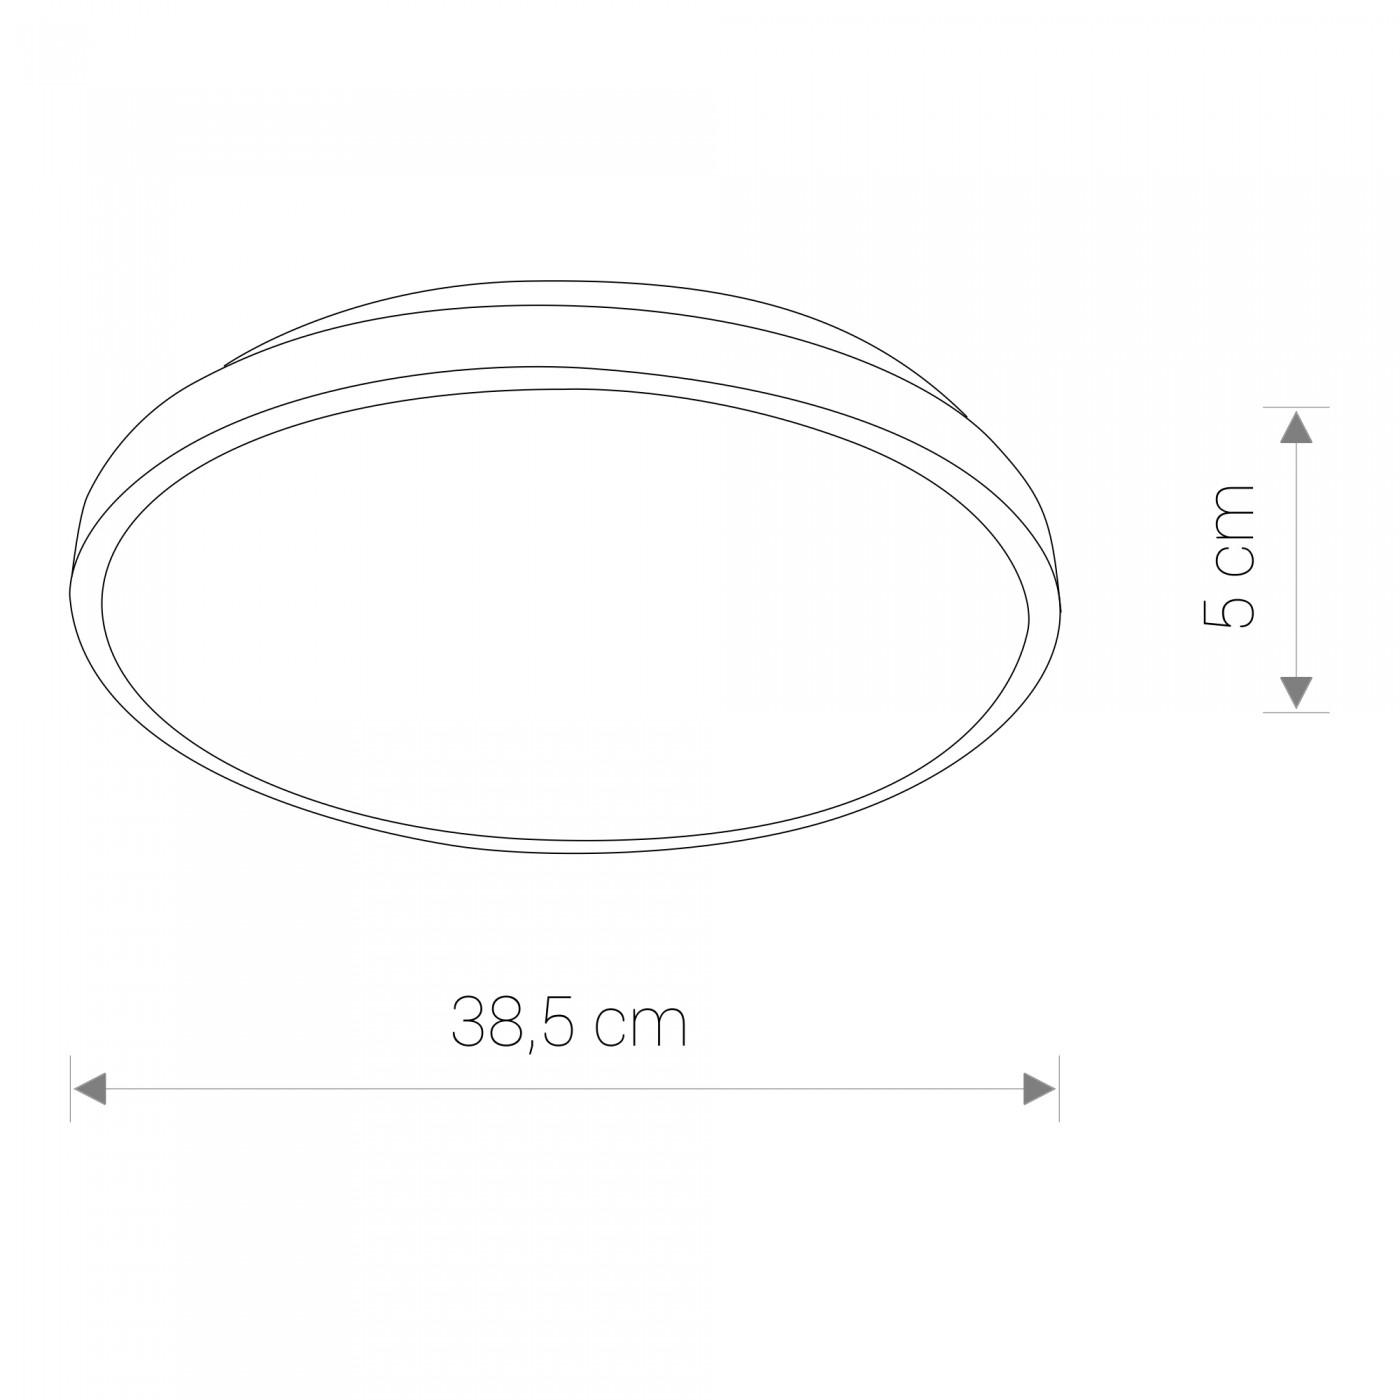 Nowodvorski TL-8204 Agnes Round LED víz-védett mennyezeti lámpa